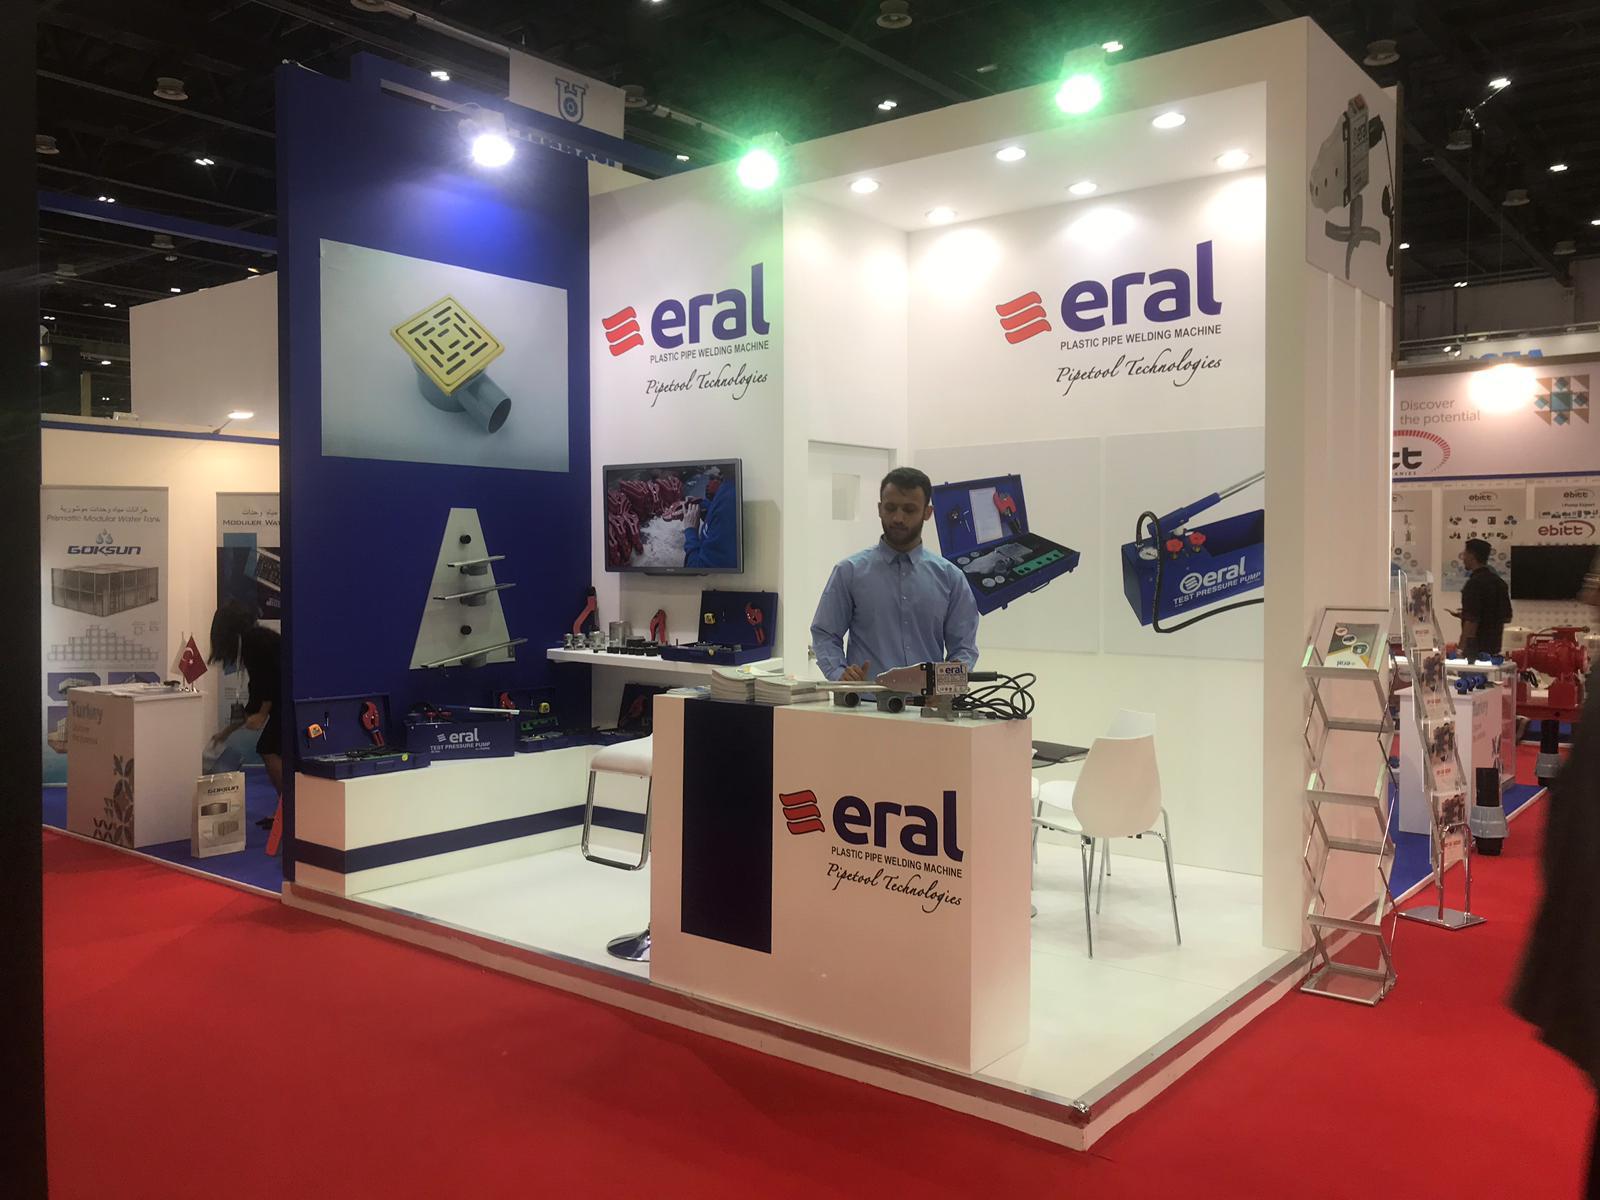 <a href='application-detail/158'>CLICK HERE - Big 5 Dubai 2018 Eral Stand   SHOW MORE<a/>